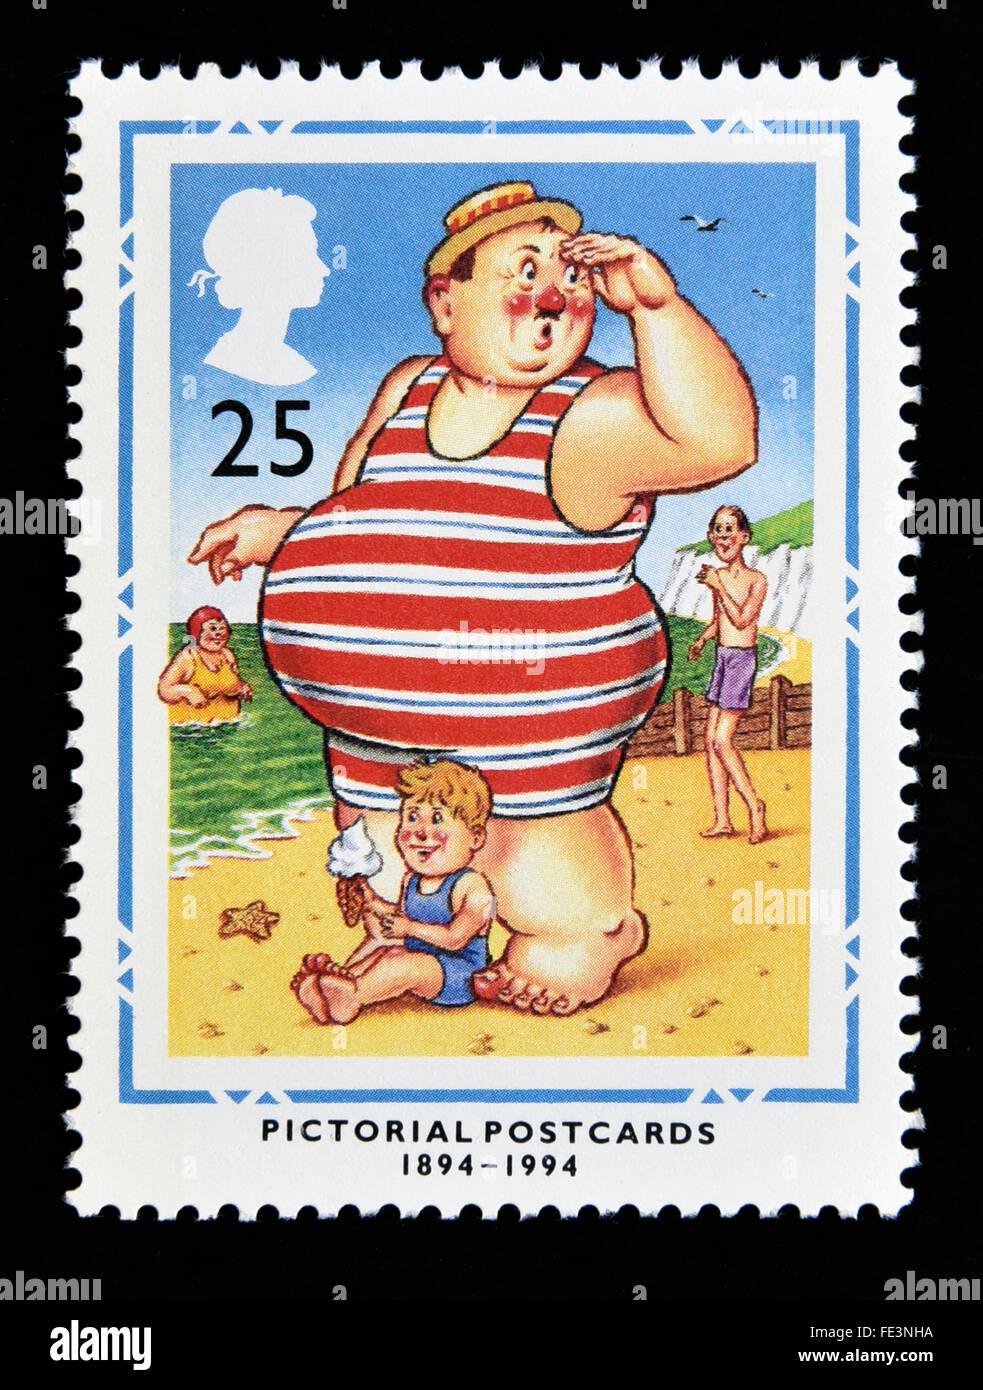 Postage stamp. Great Britain. Queen Elizabeth II. 1994. Centenary of Pictorial Postcards. 1894-1994. 25p. - Stock Image